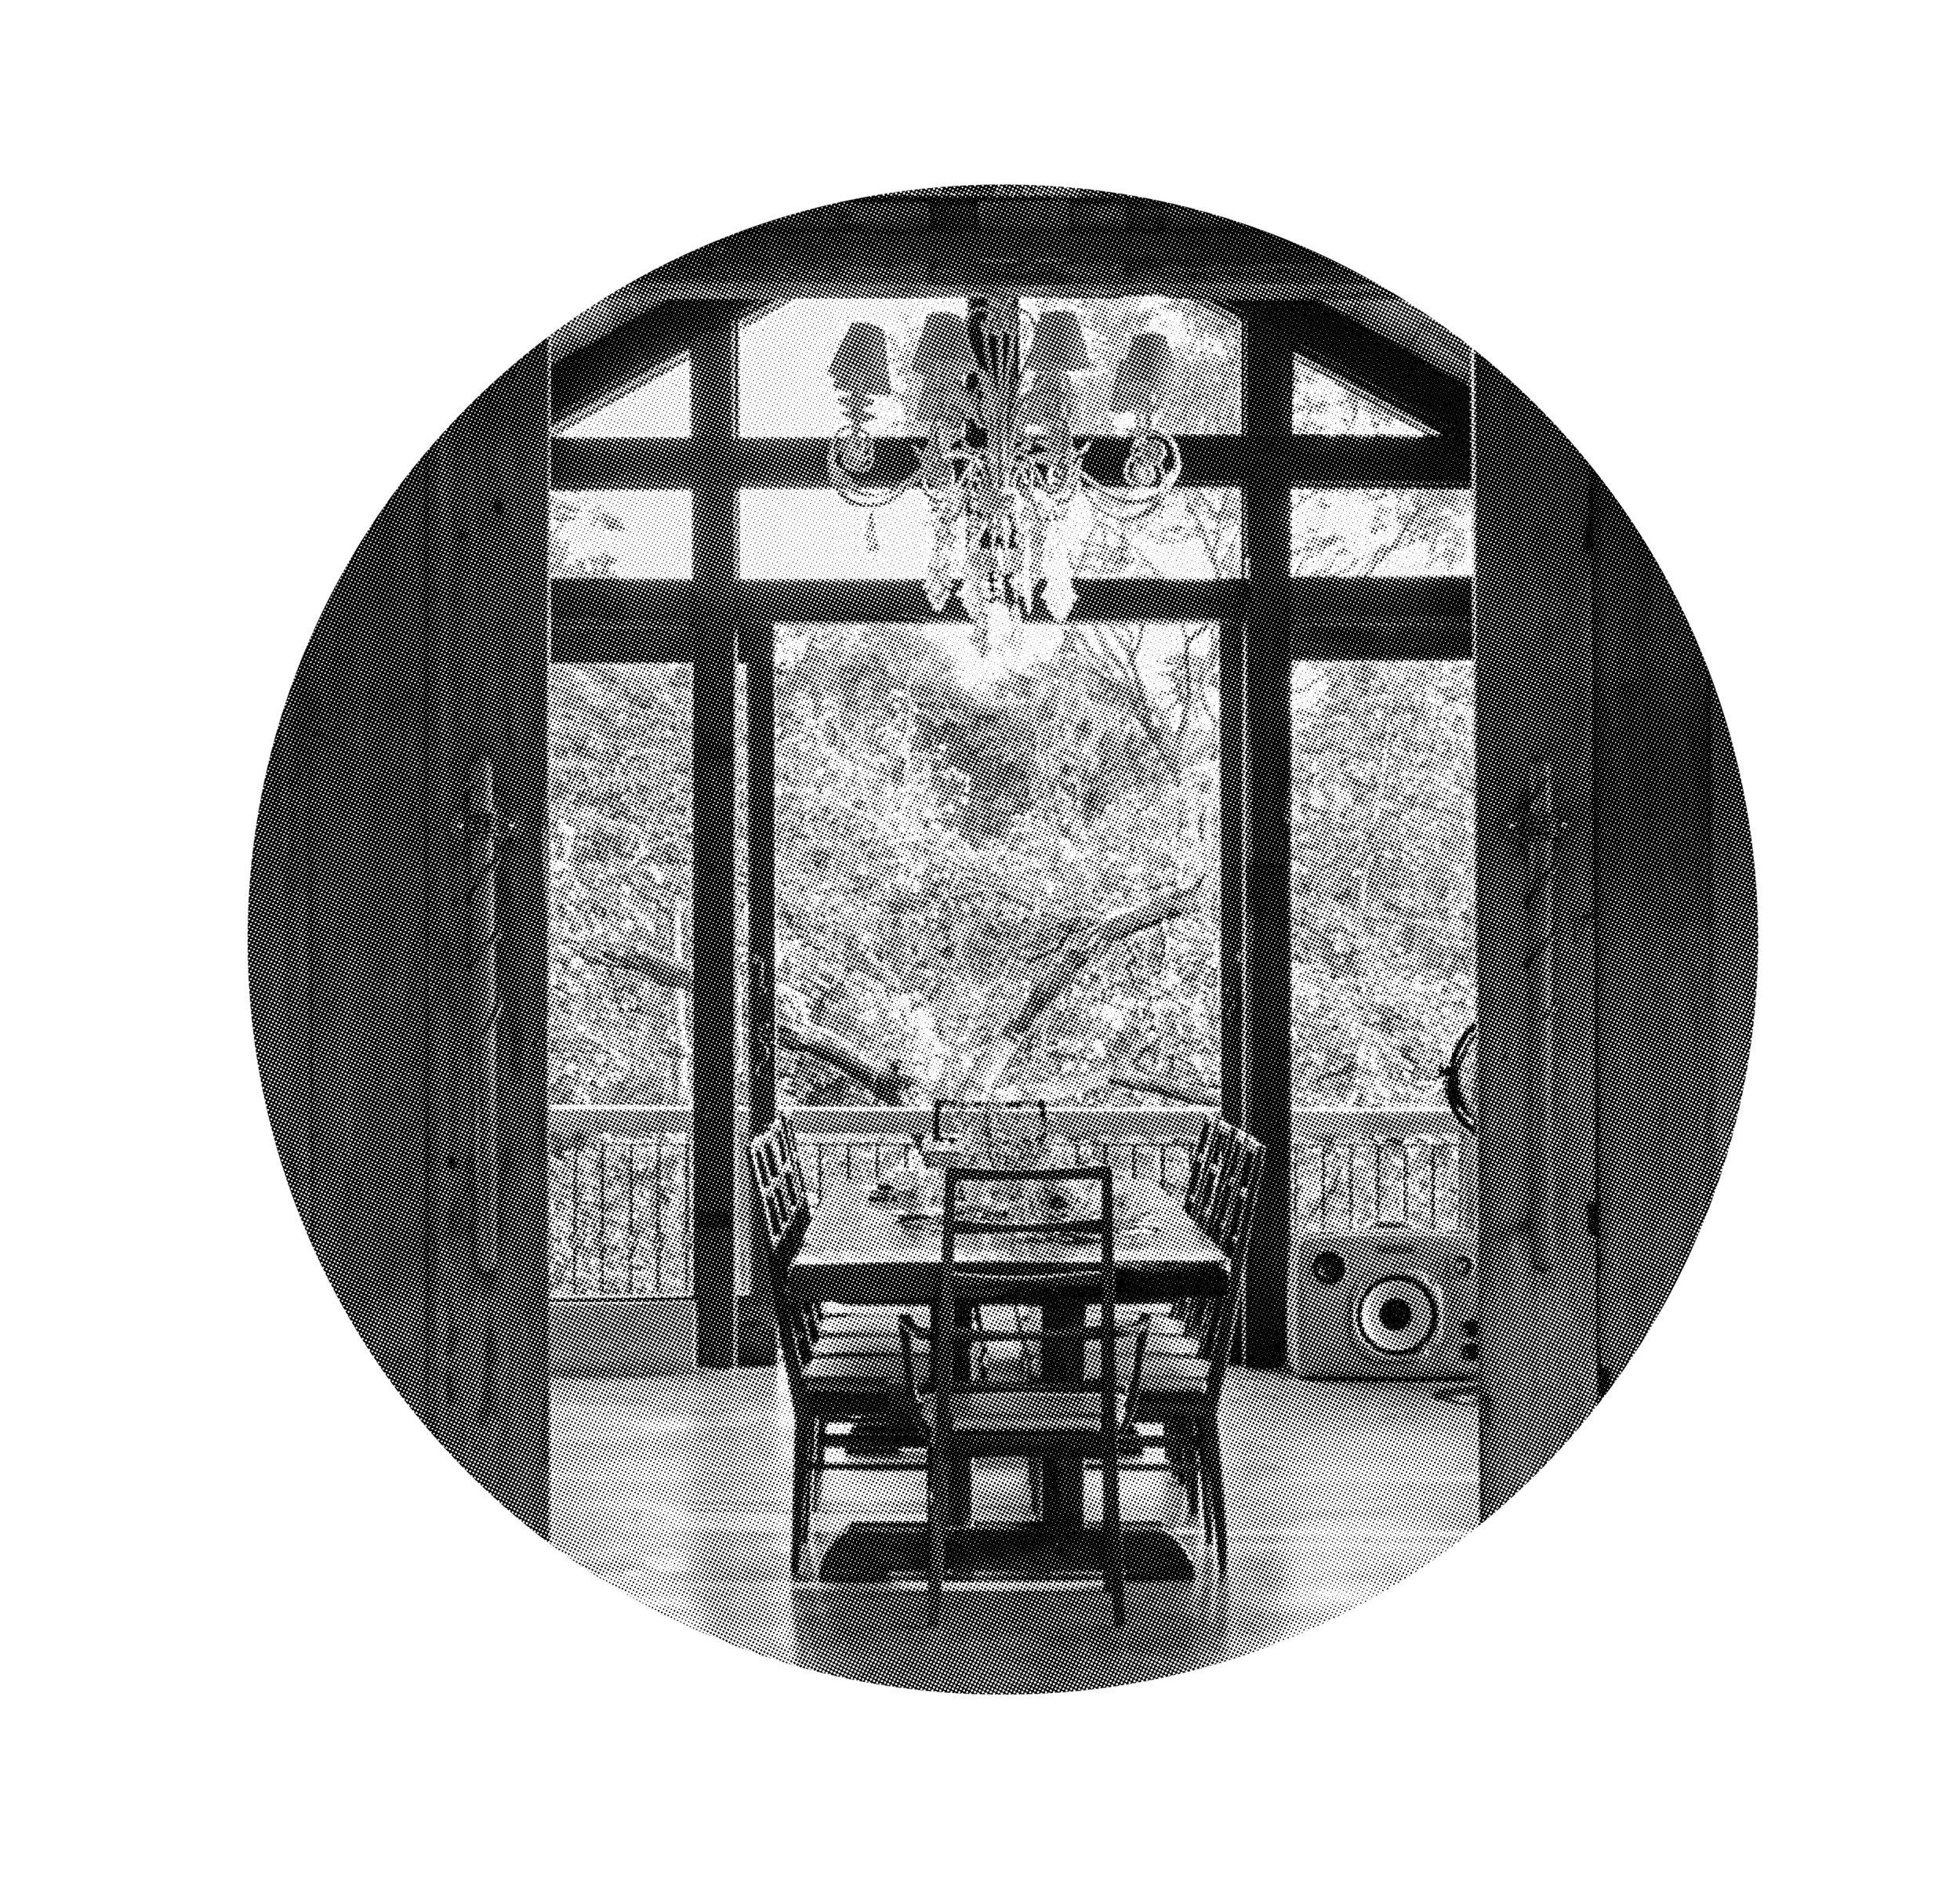 61-Real-Homes-GUTIERREZ-2-ht-circle.jpg